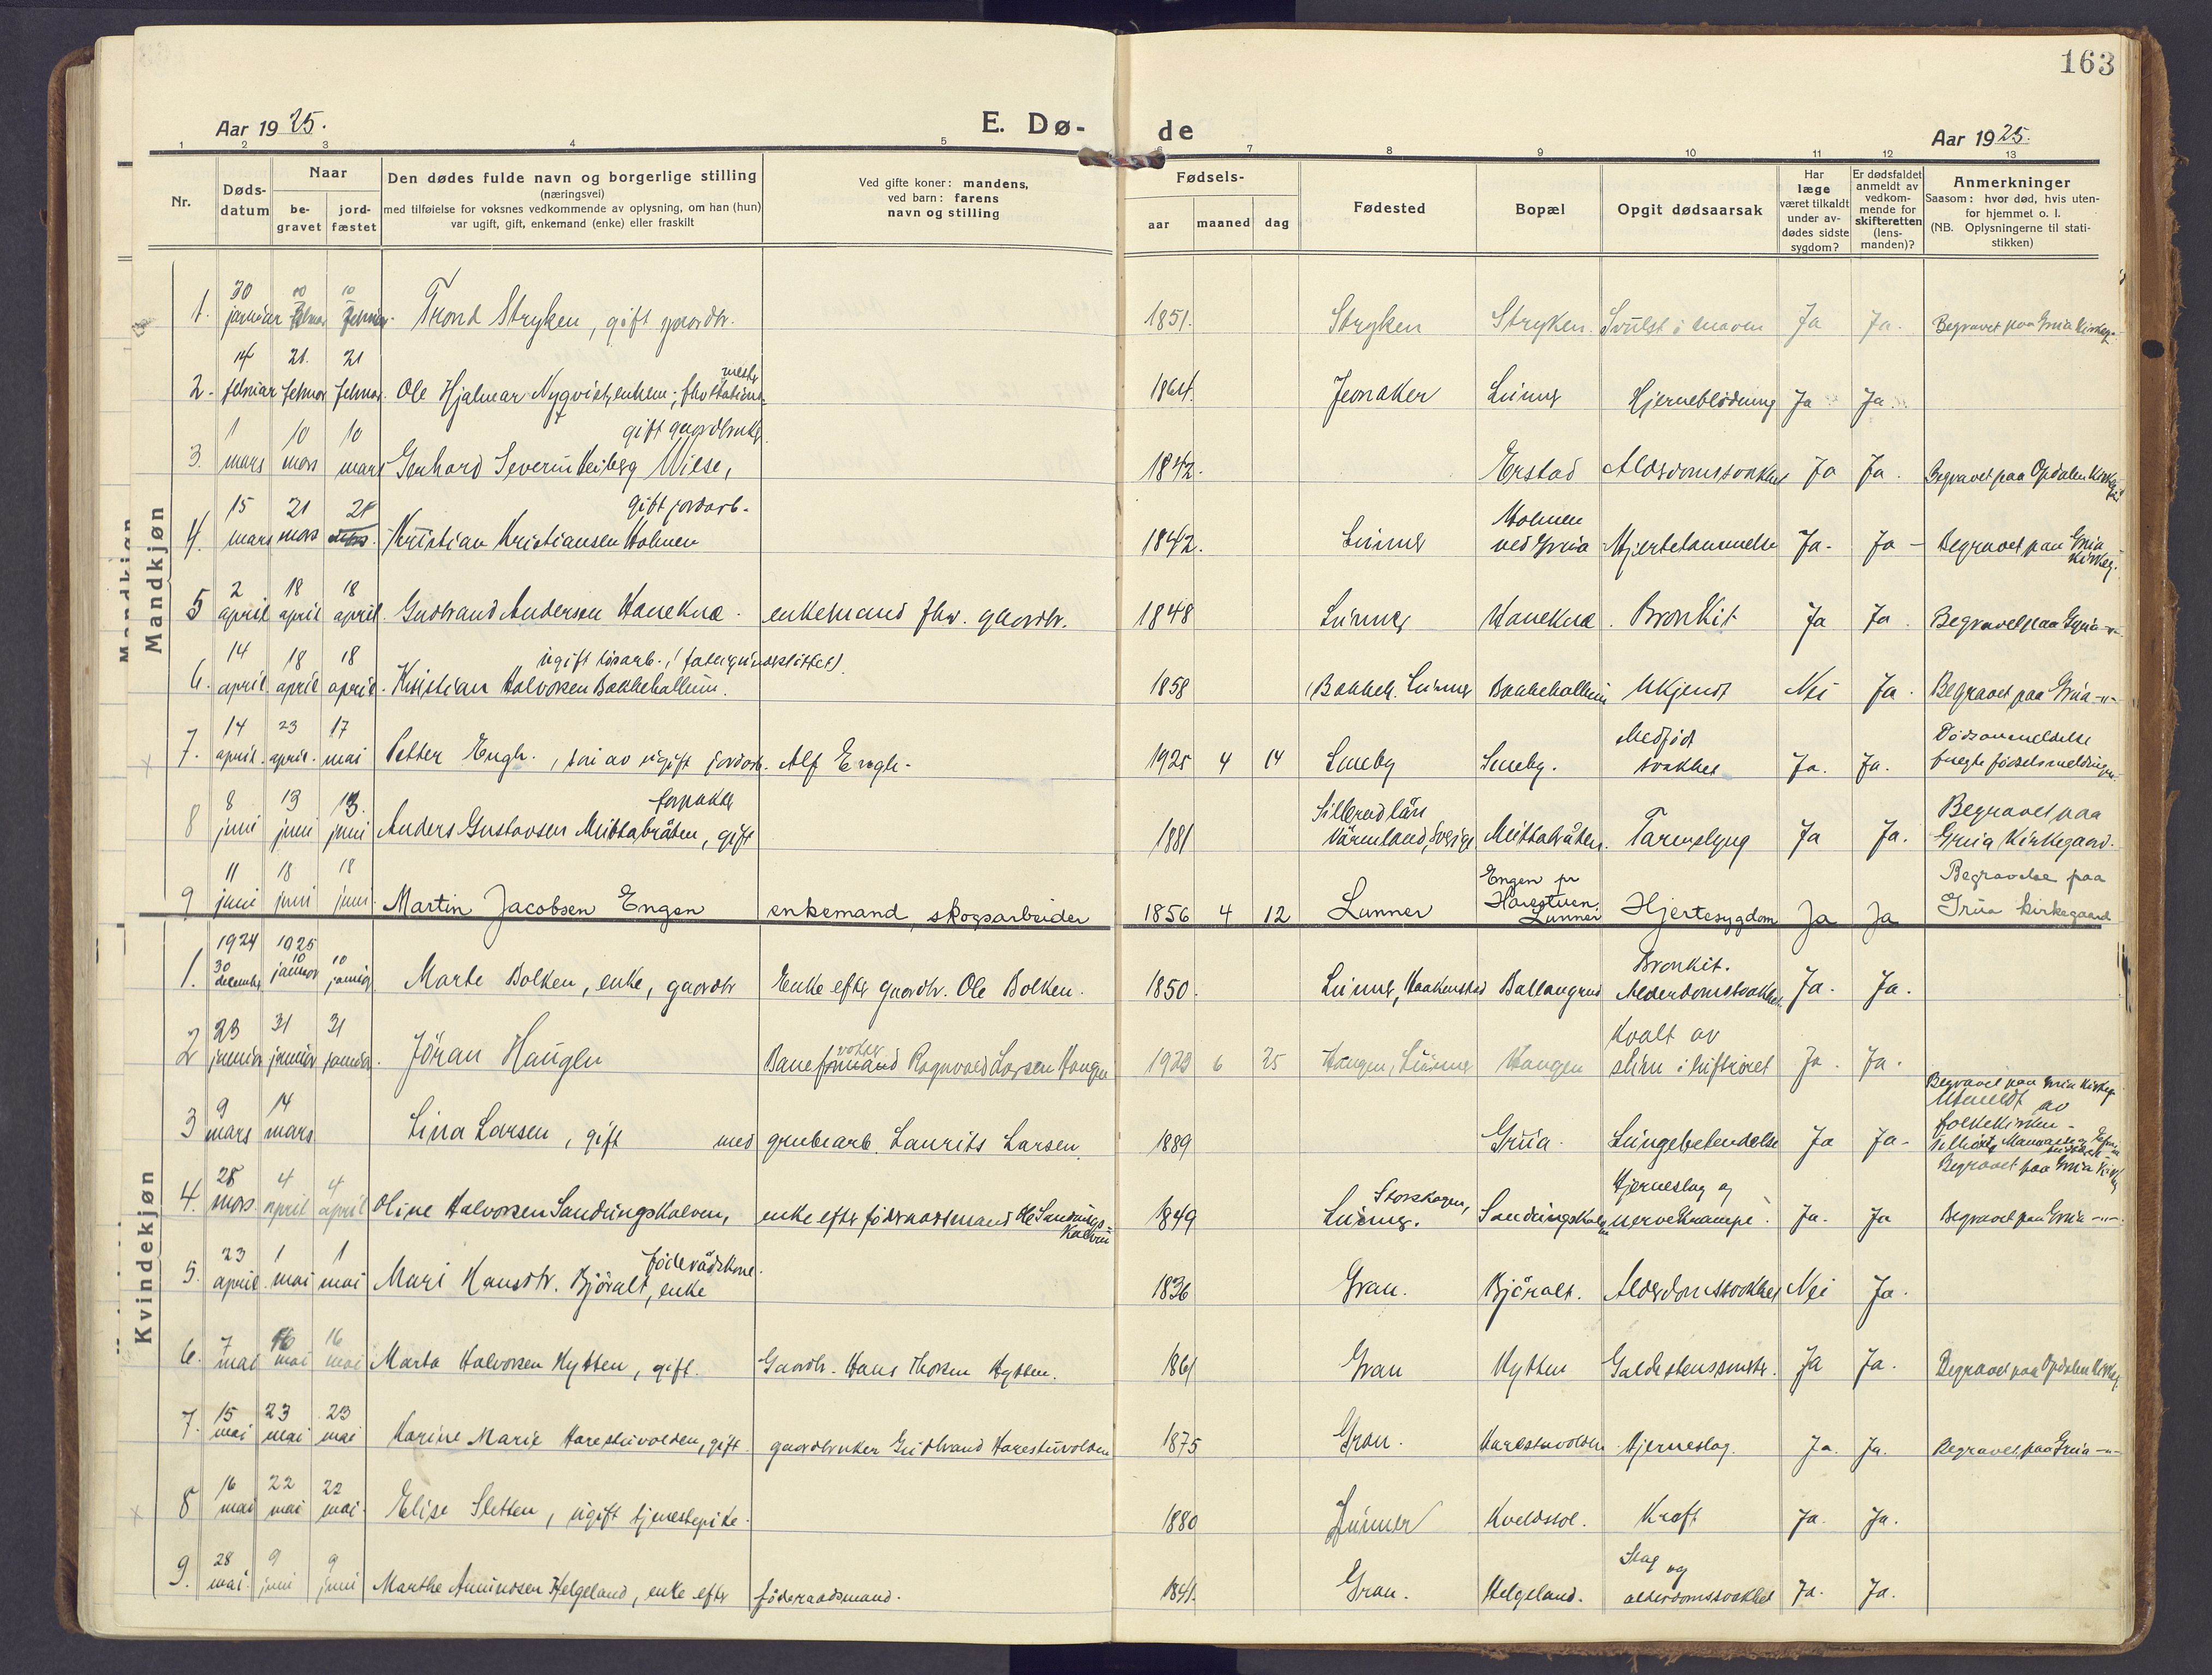 SAH, Lunner prestekontor, H/Ha/Haa/L0002: Ministerialbok nr. 2, 1922-1931, s. 163